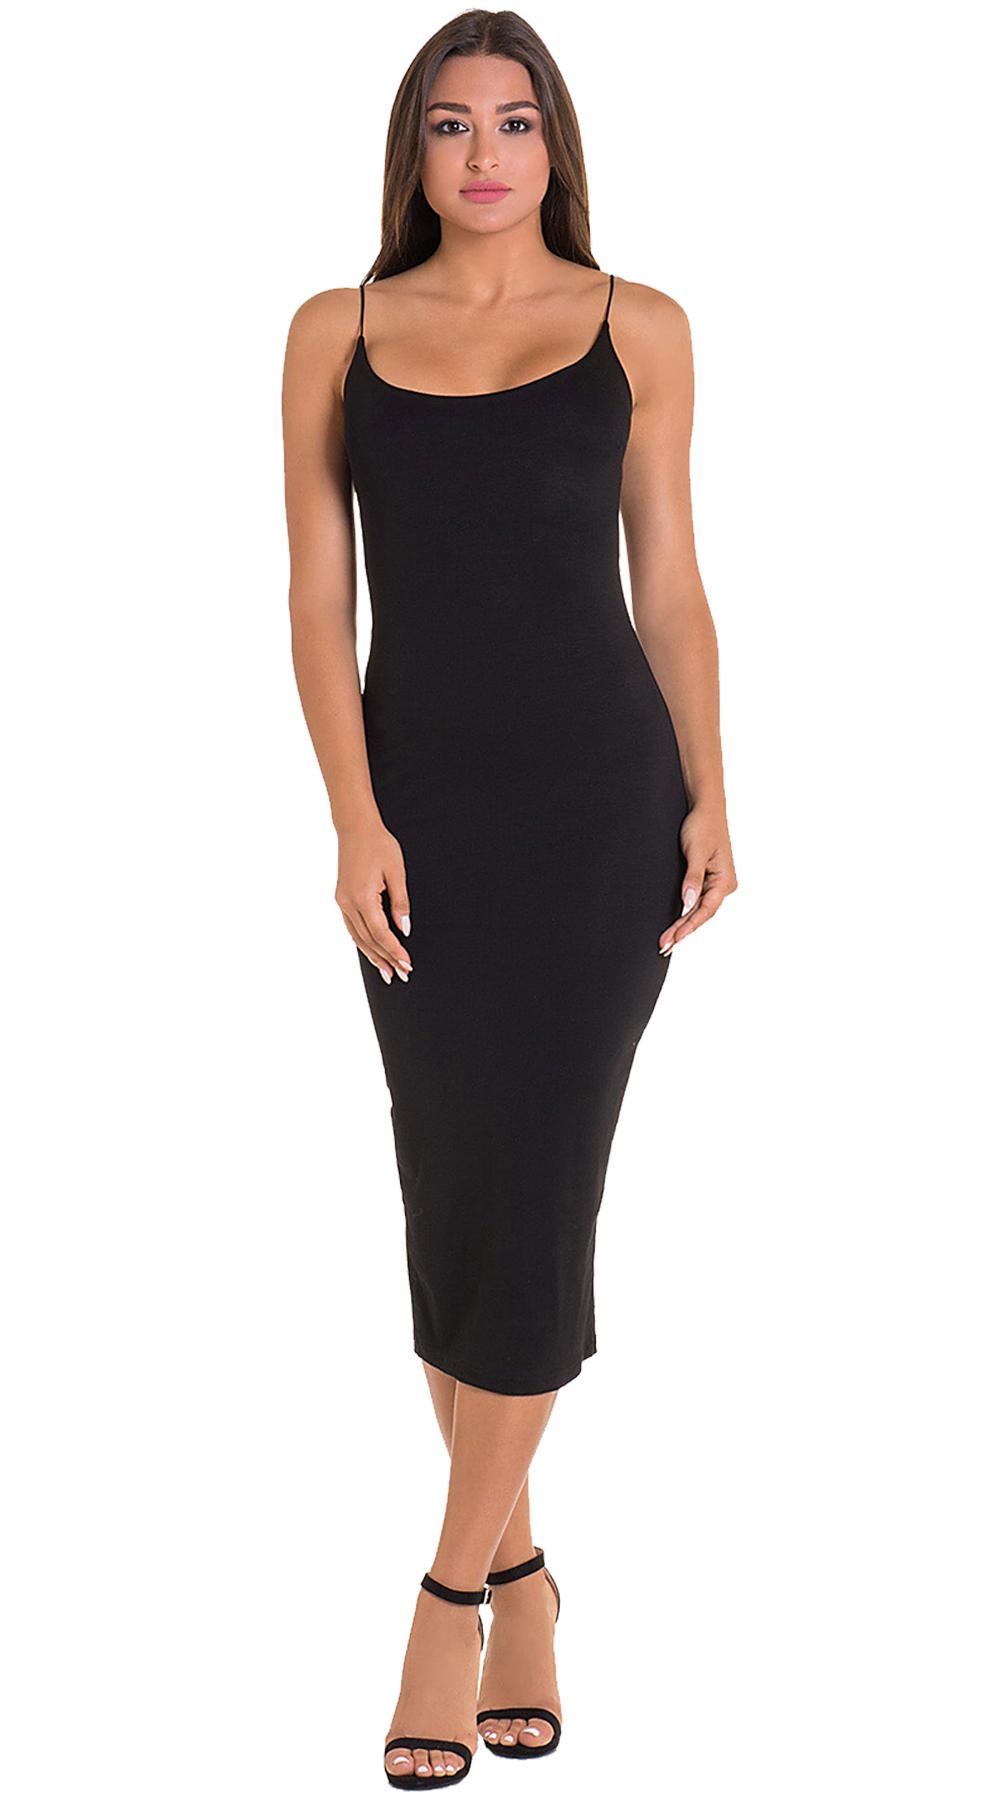 Bodycon Μονόχρωμο Φόρεμα ONLINE - ONLINE - SS19ON-51373